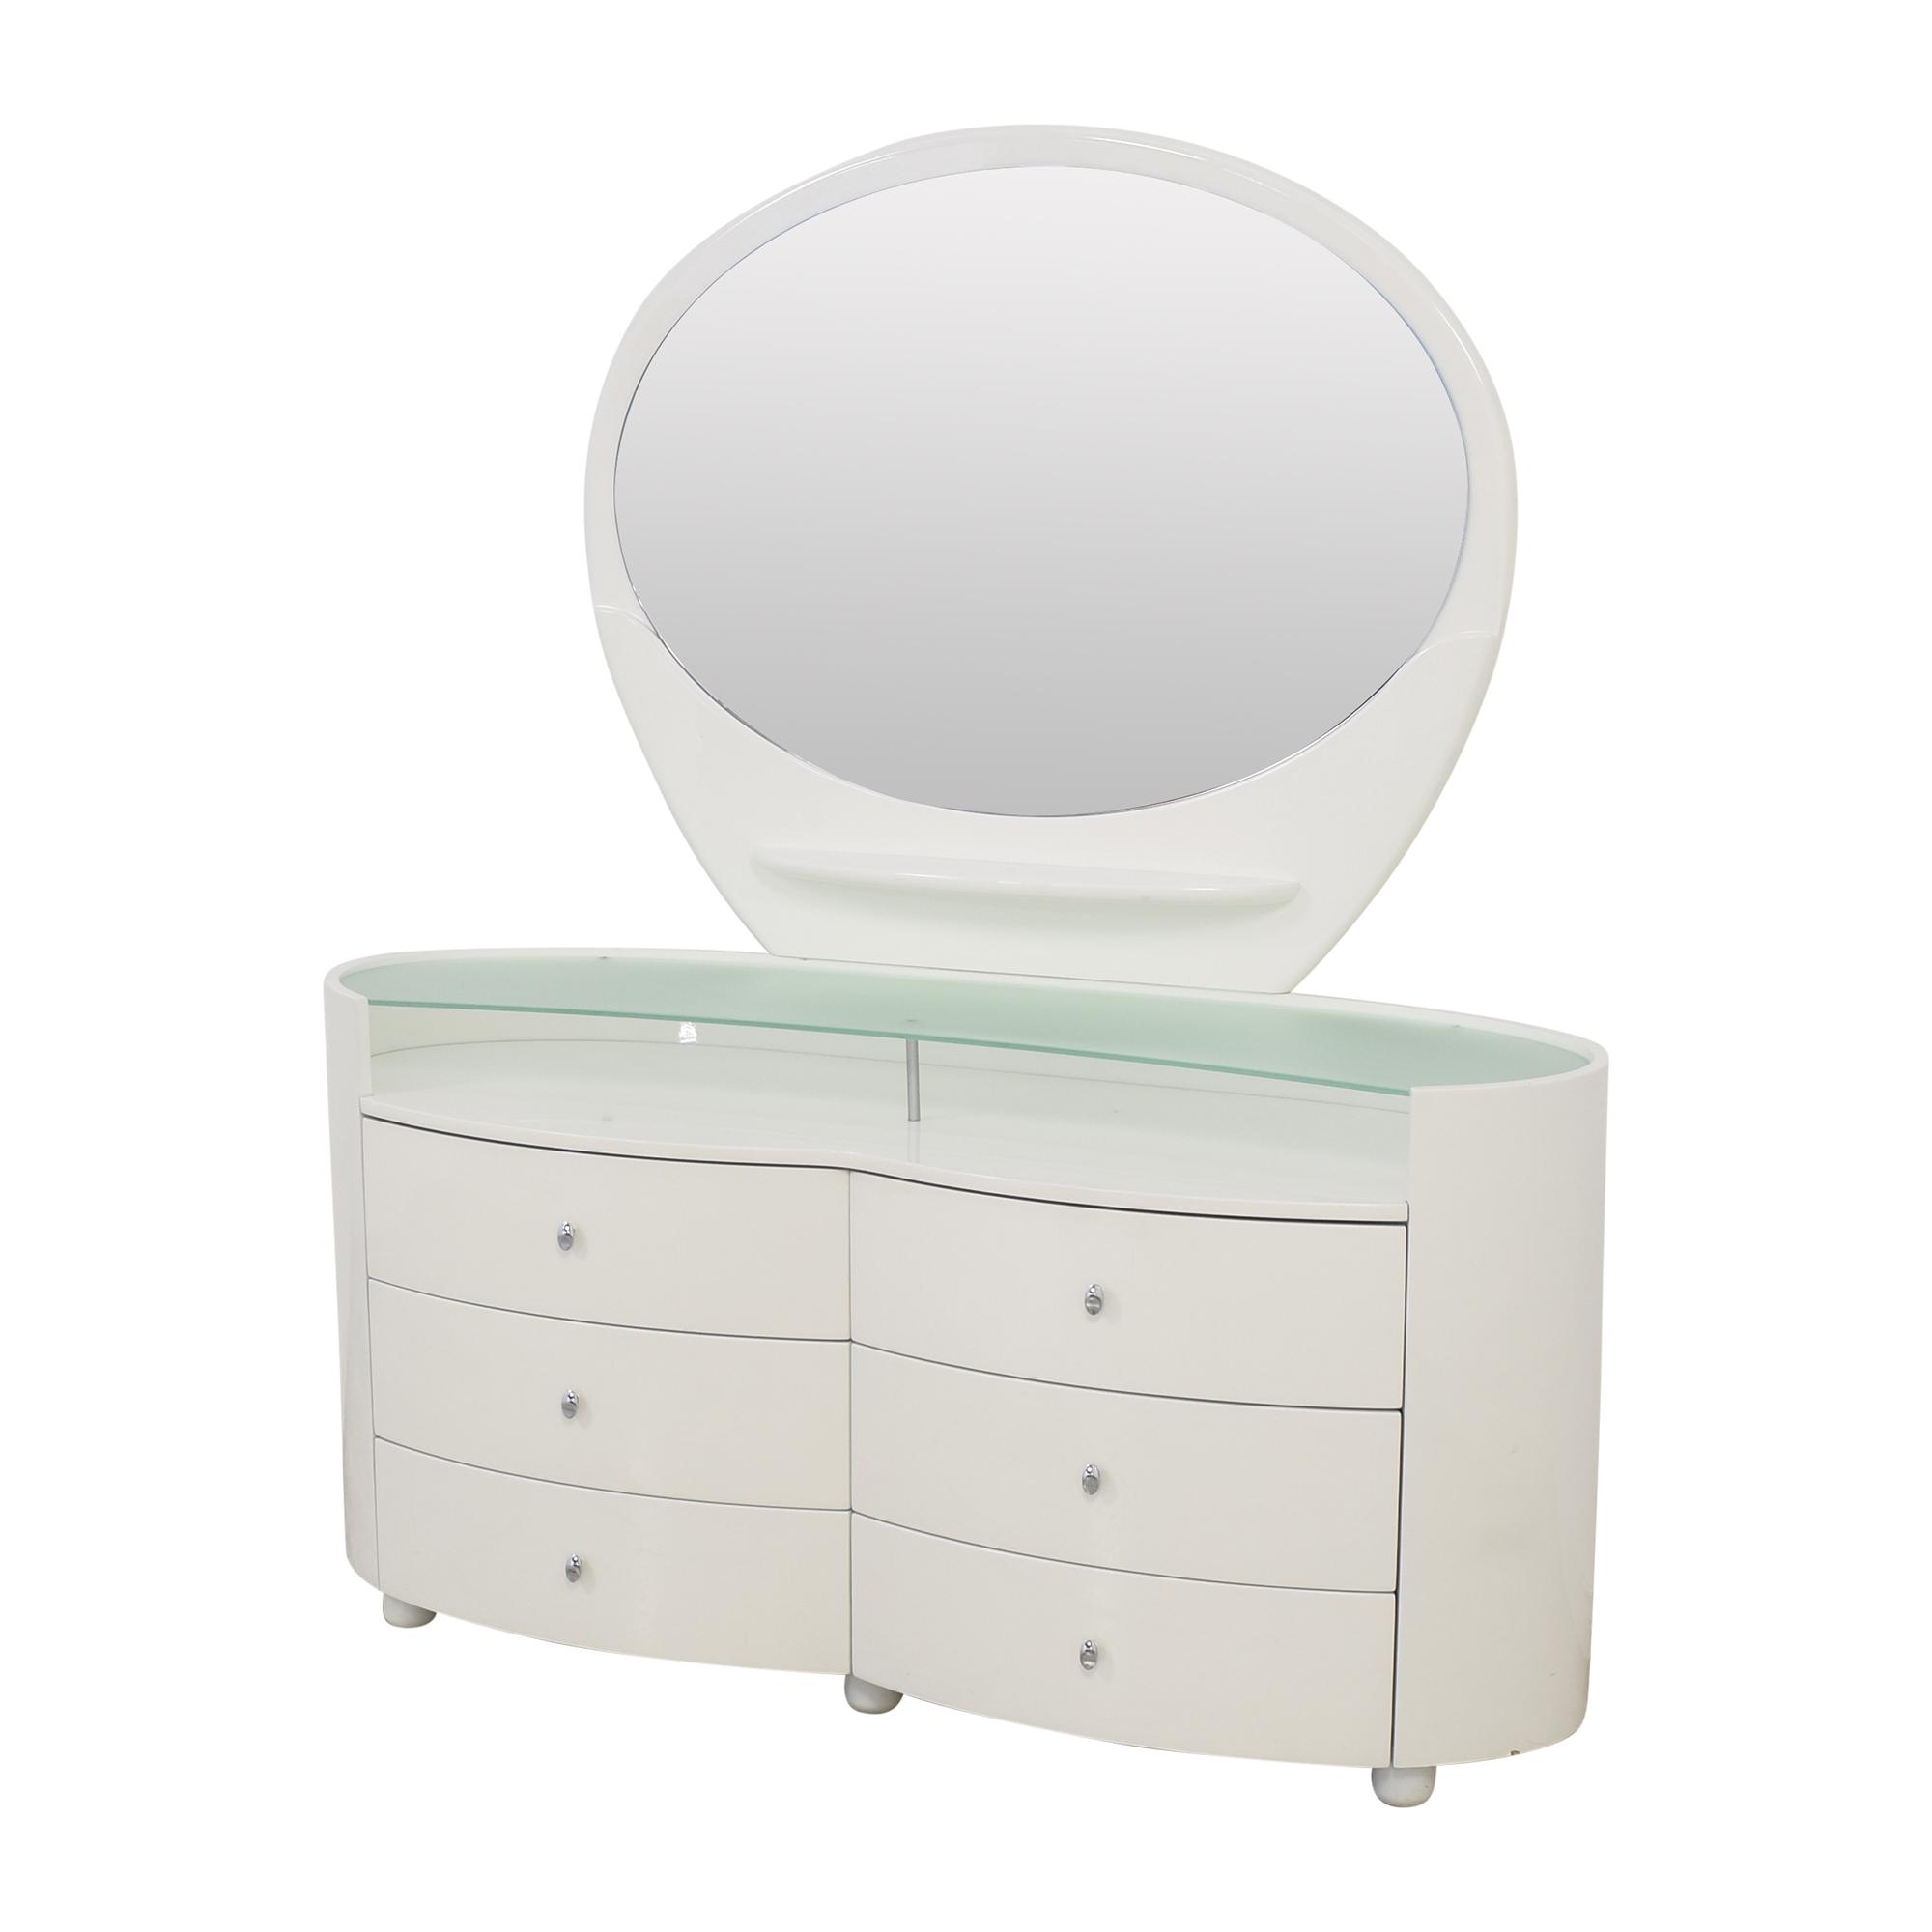 Vintage Style Dresser with Vanity Mirror white